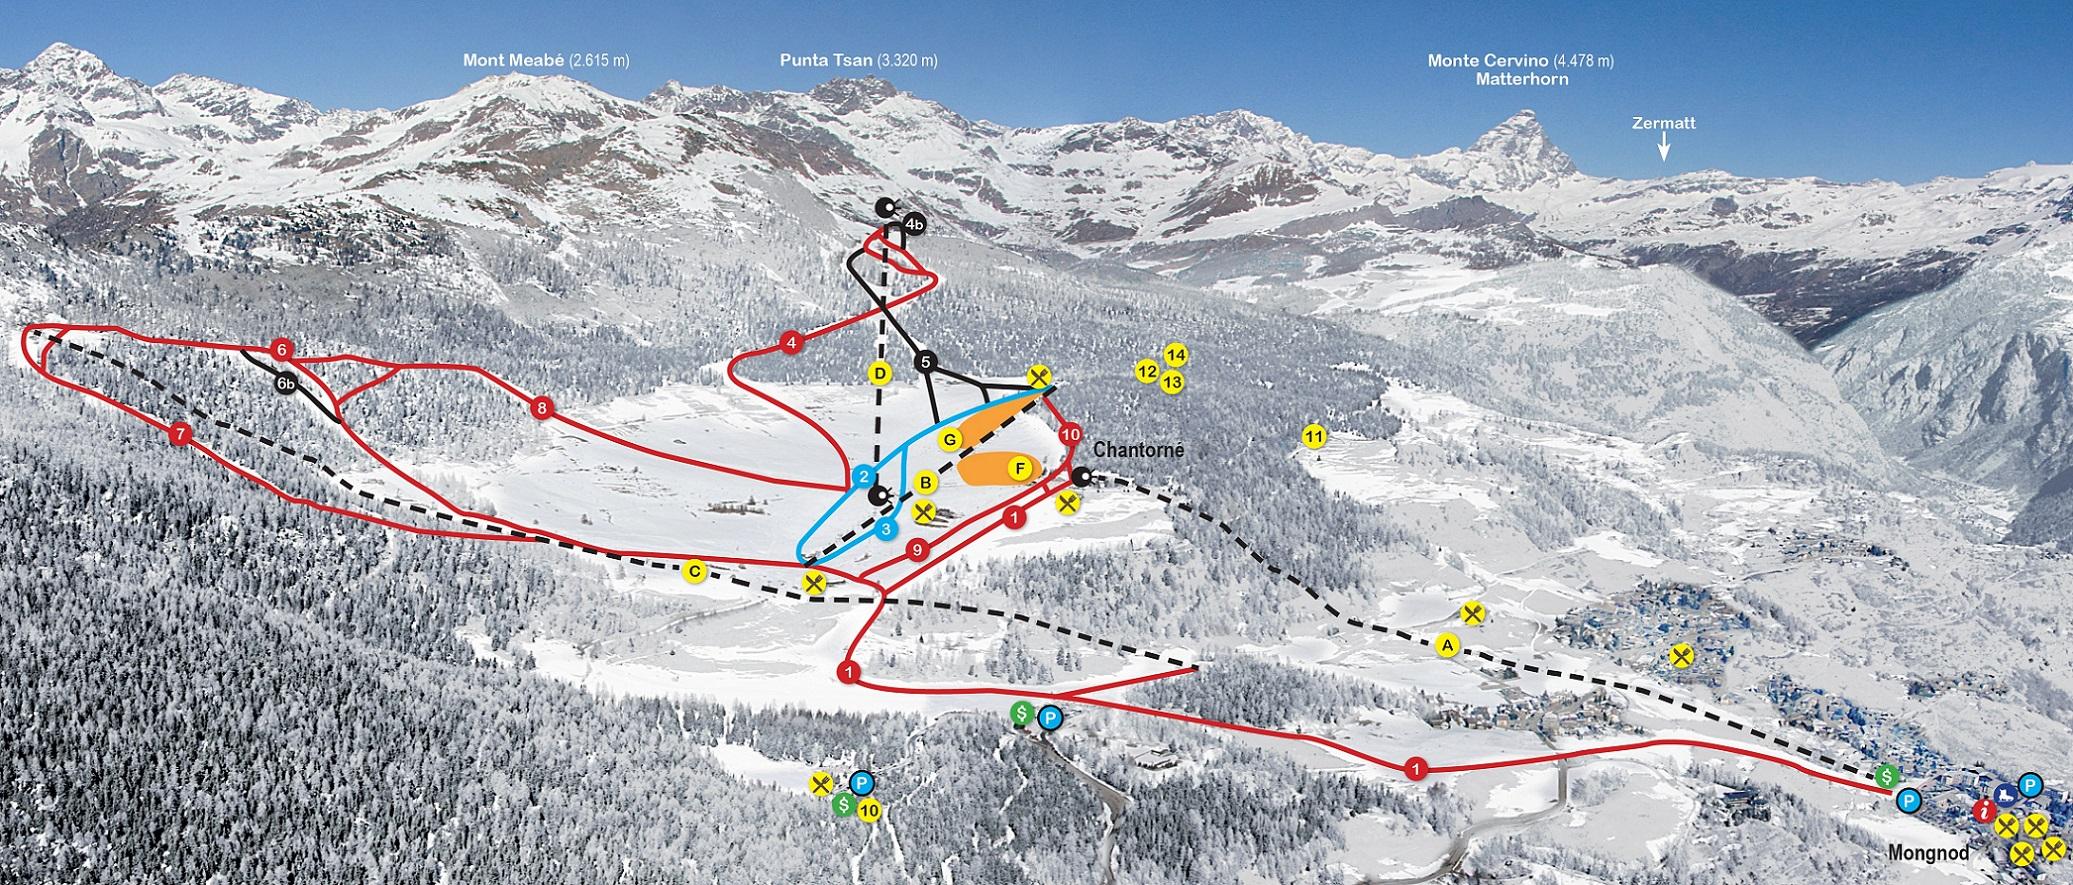 Torgnon Piste / Trail Map